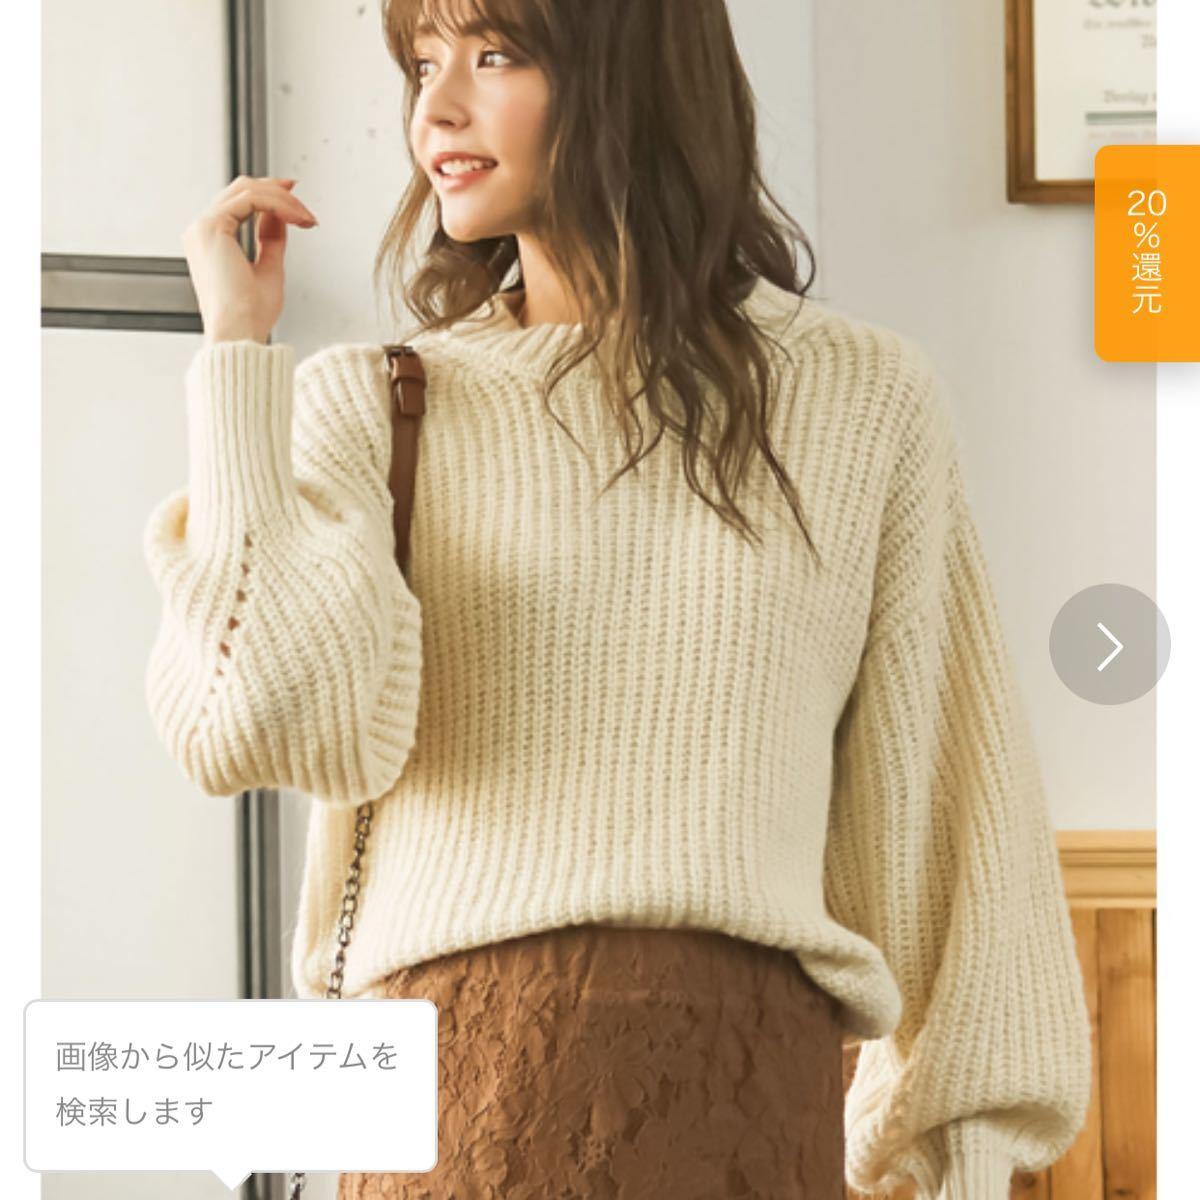 【Re:EDIT】 ニット/セーター